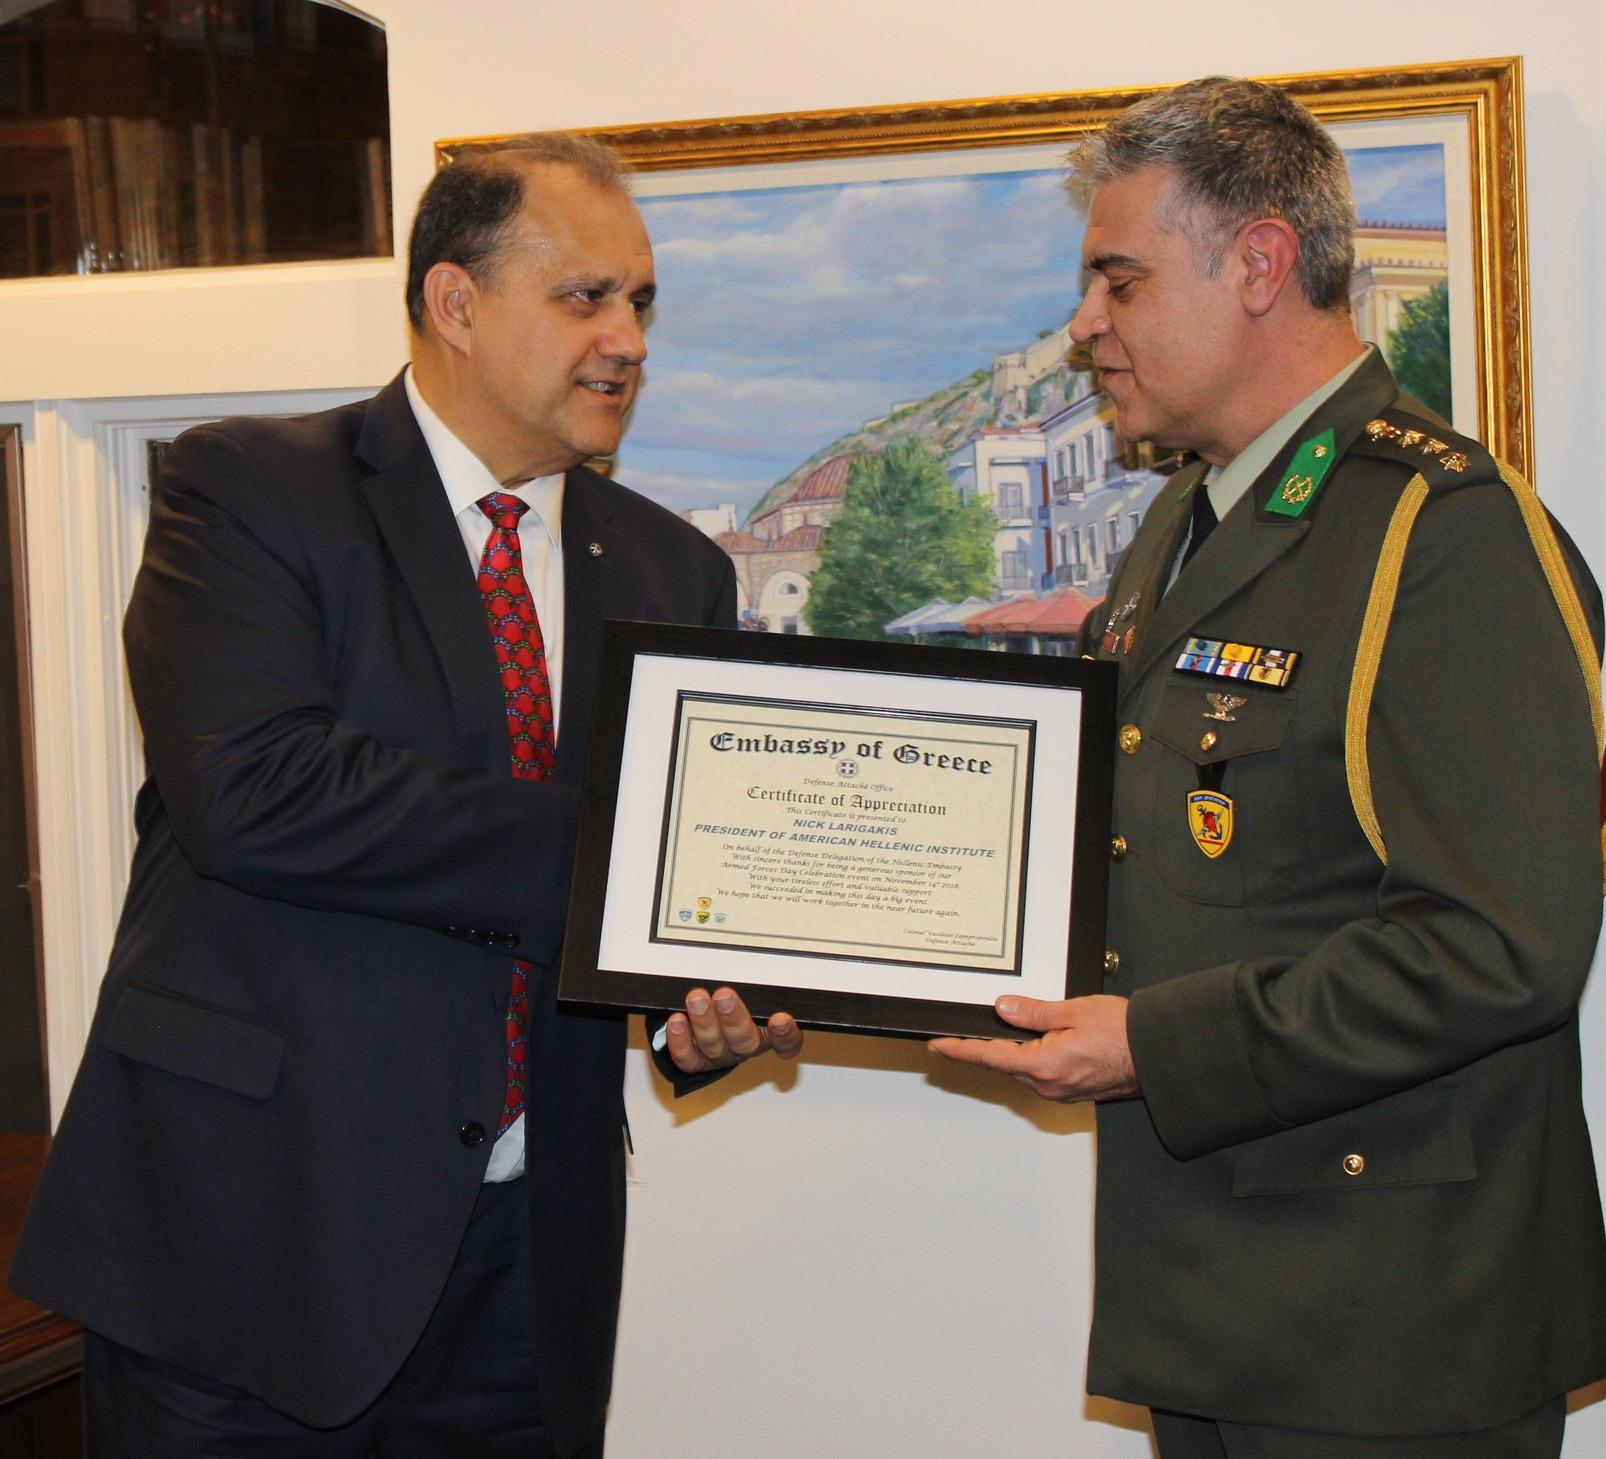 President Nick Larigakis (L) Receives Certificate of Appreciation From Defense Attaché Colonel Vasileios Lampropoulos (R)